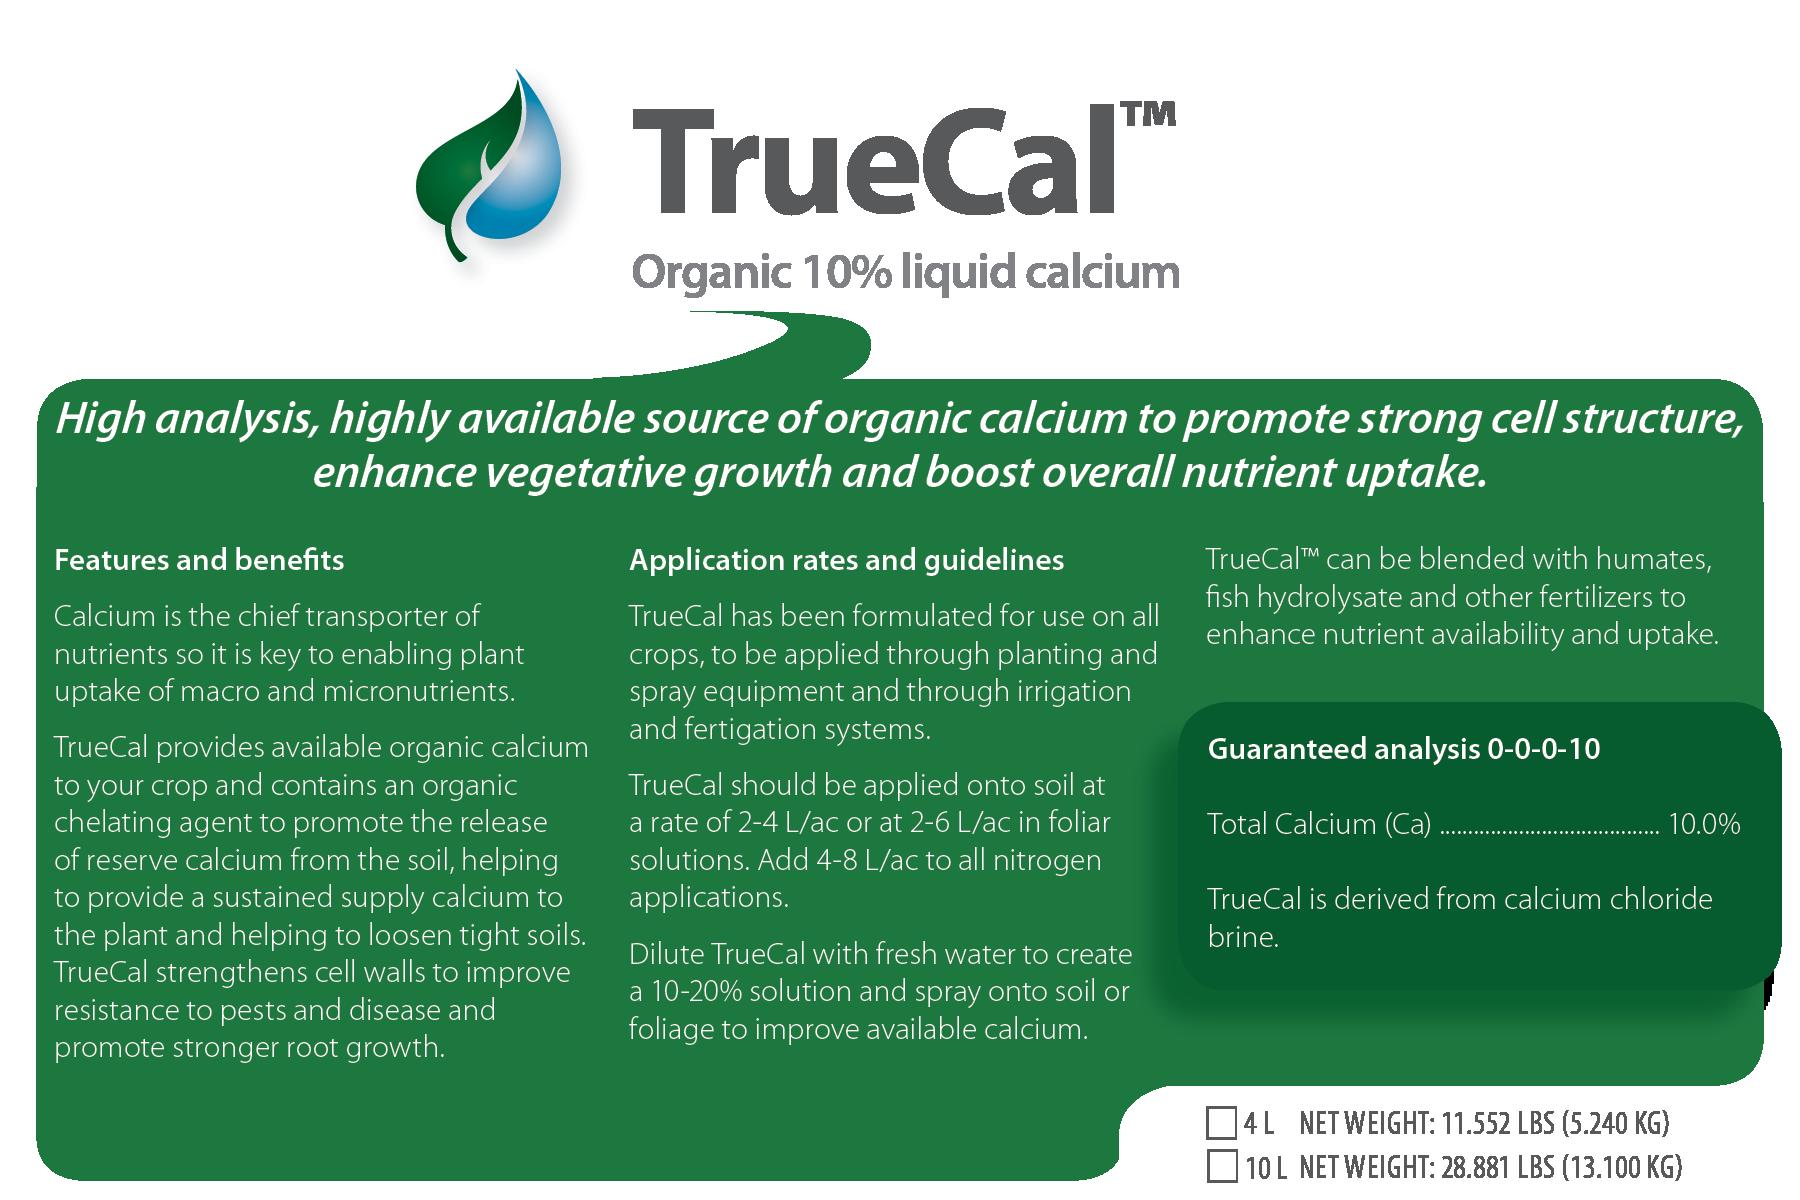 TrueCal organic